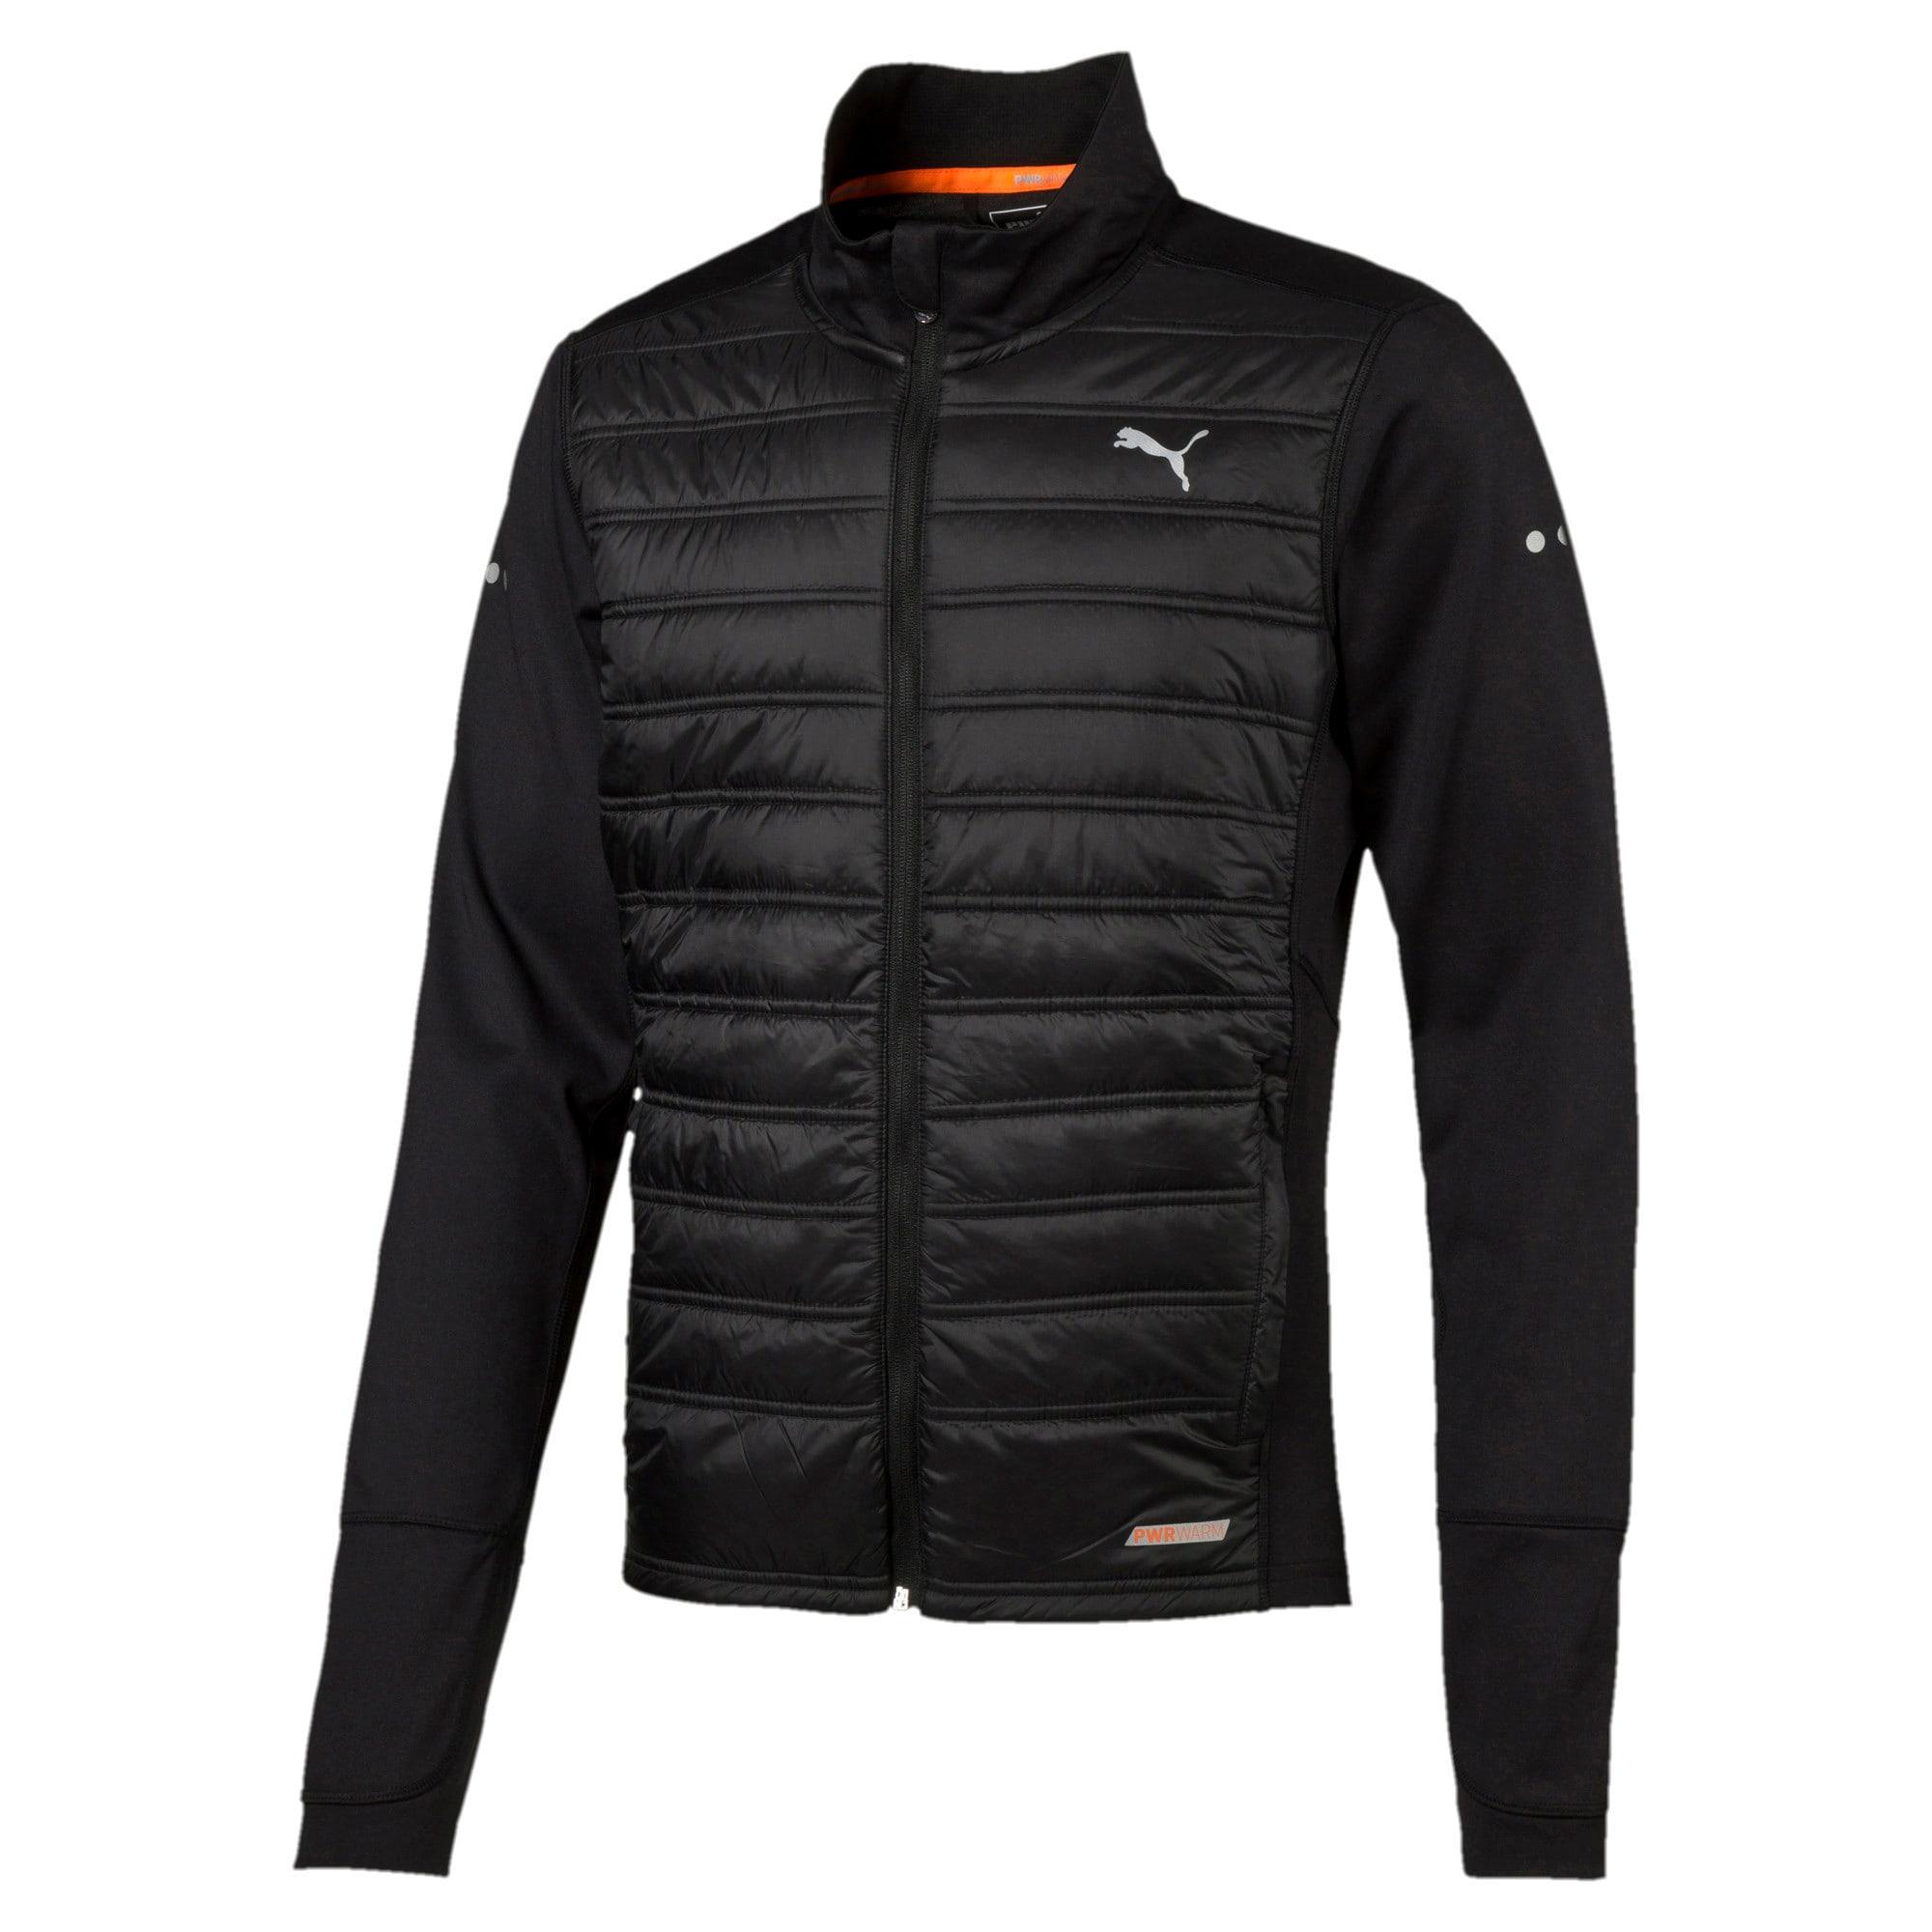 Thumbnail 1 of Running PWRWARM Men's Padded Jacket, Puma Black, medium-IND